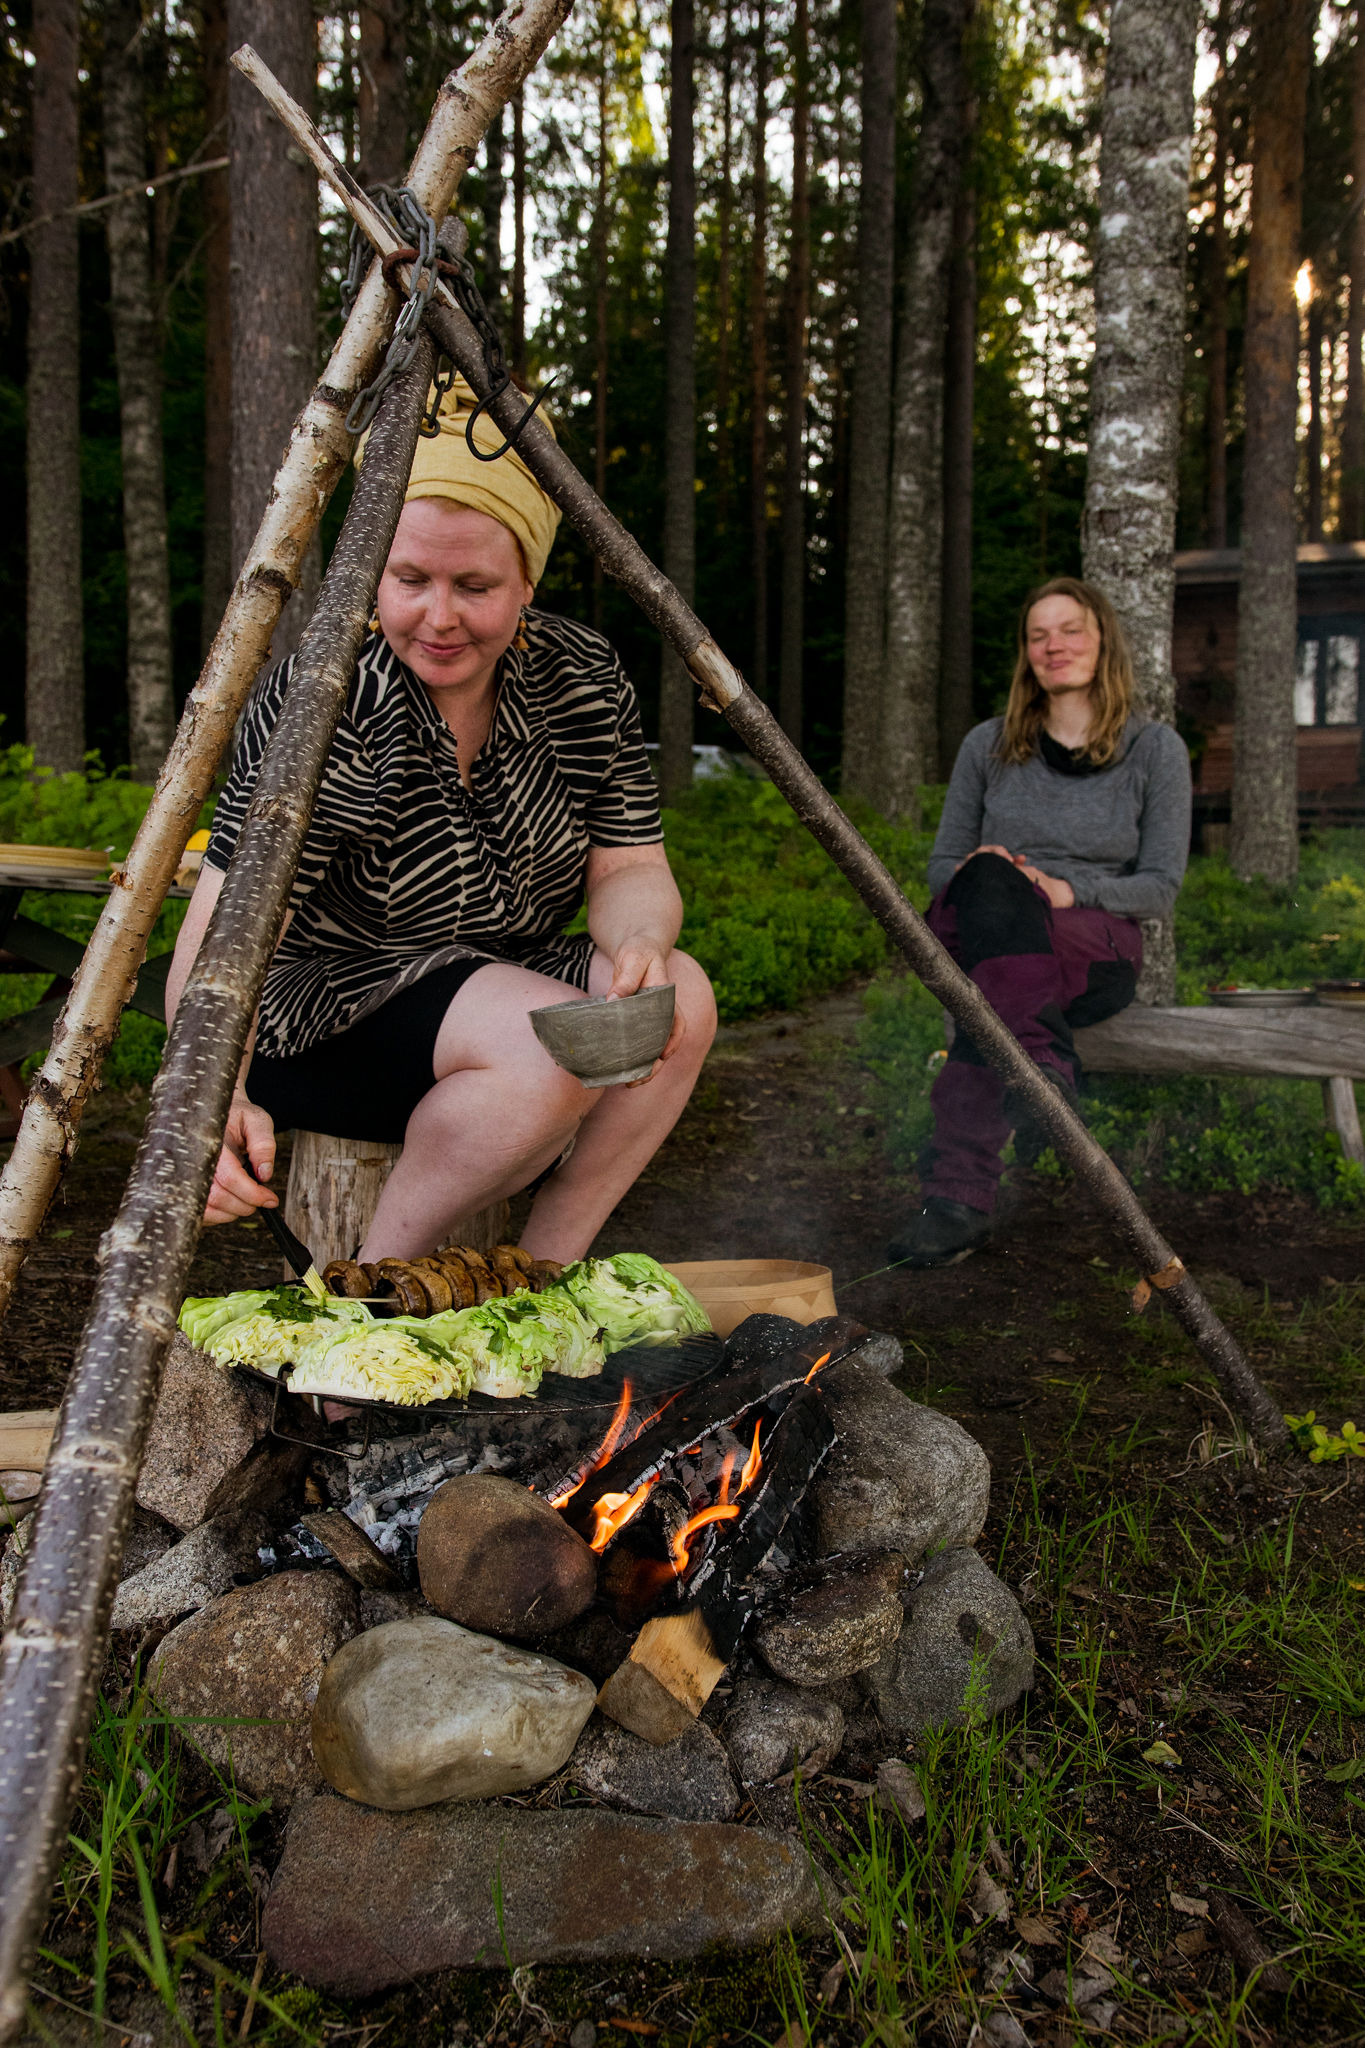 Grilling with Maija